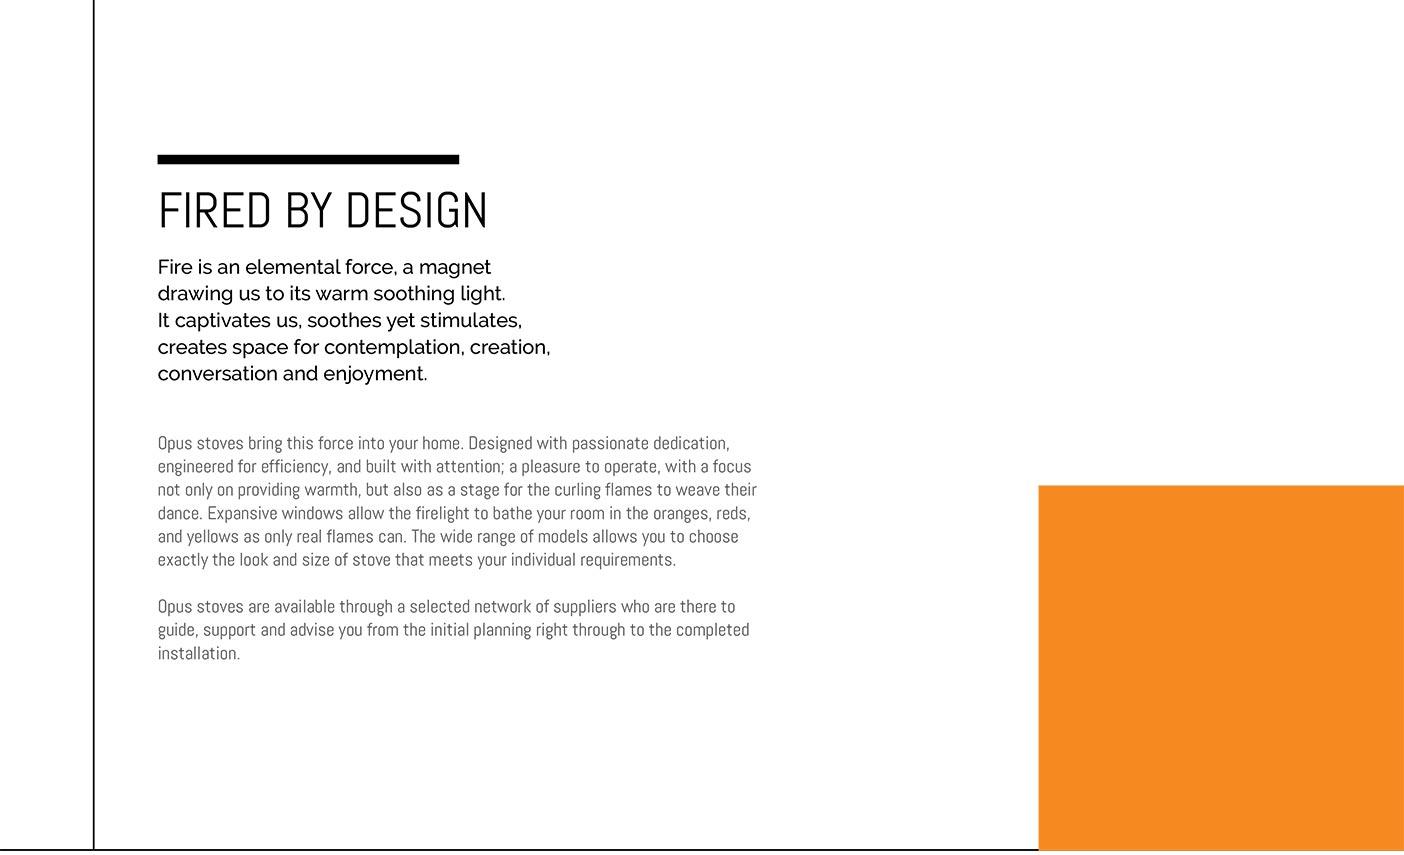 opus-stoves-brochure-(2)-4